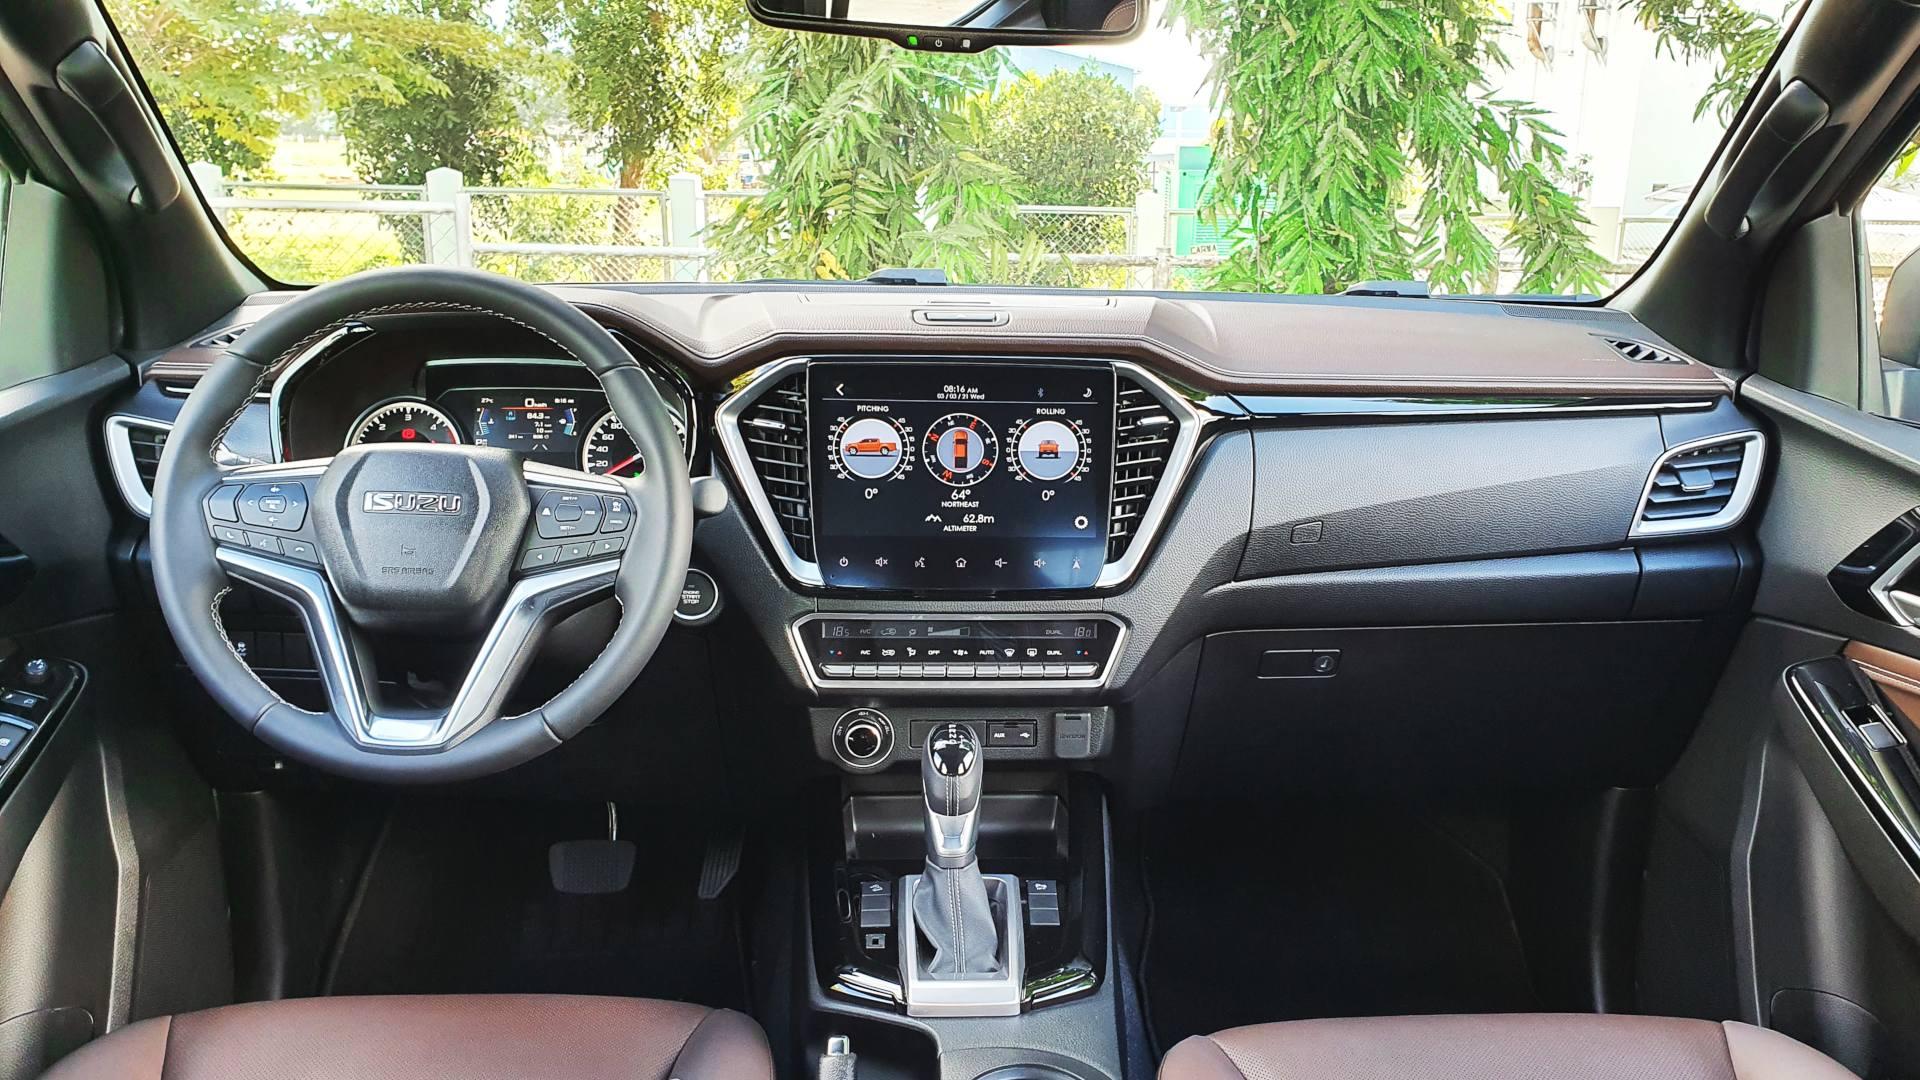 The 2021 Isuzu D-Max dashboard